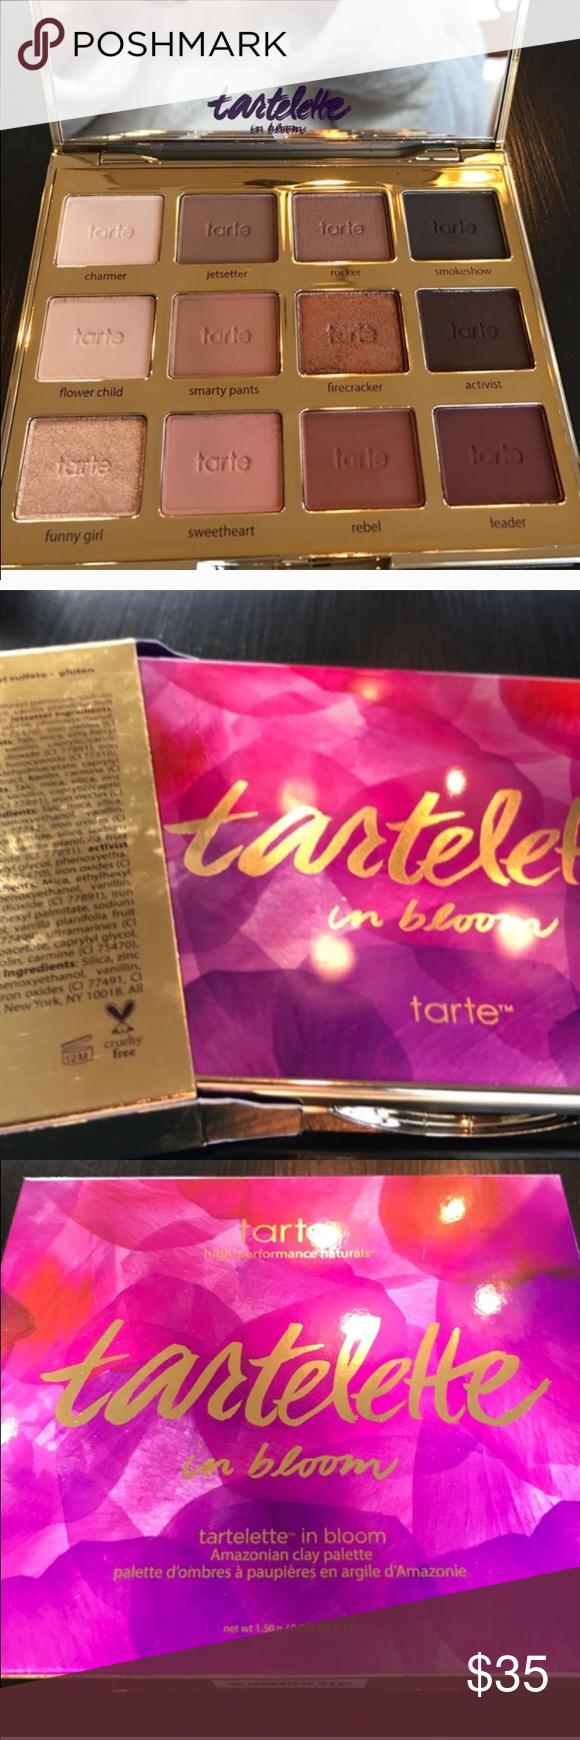 Photo of Tartelette in voller Blüte Augenpalette, Feder